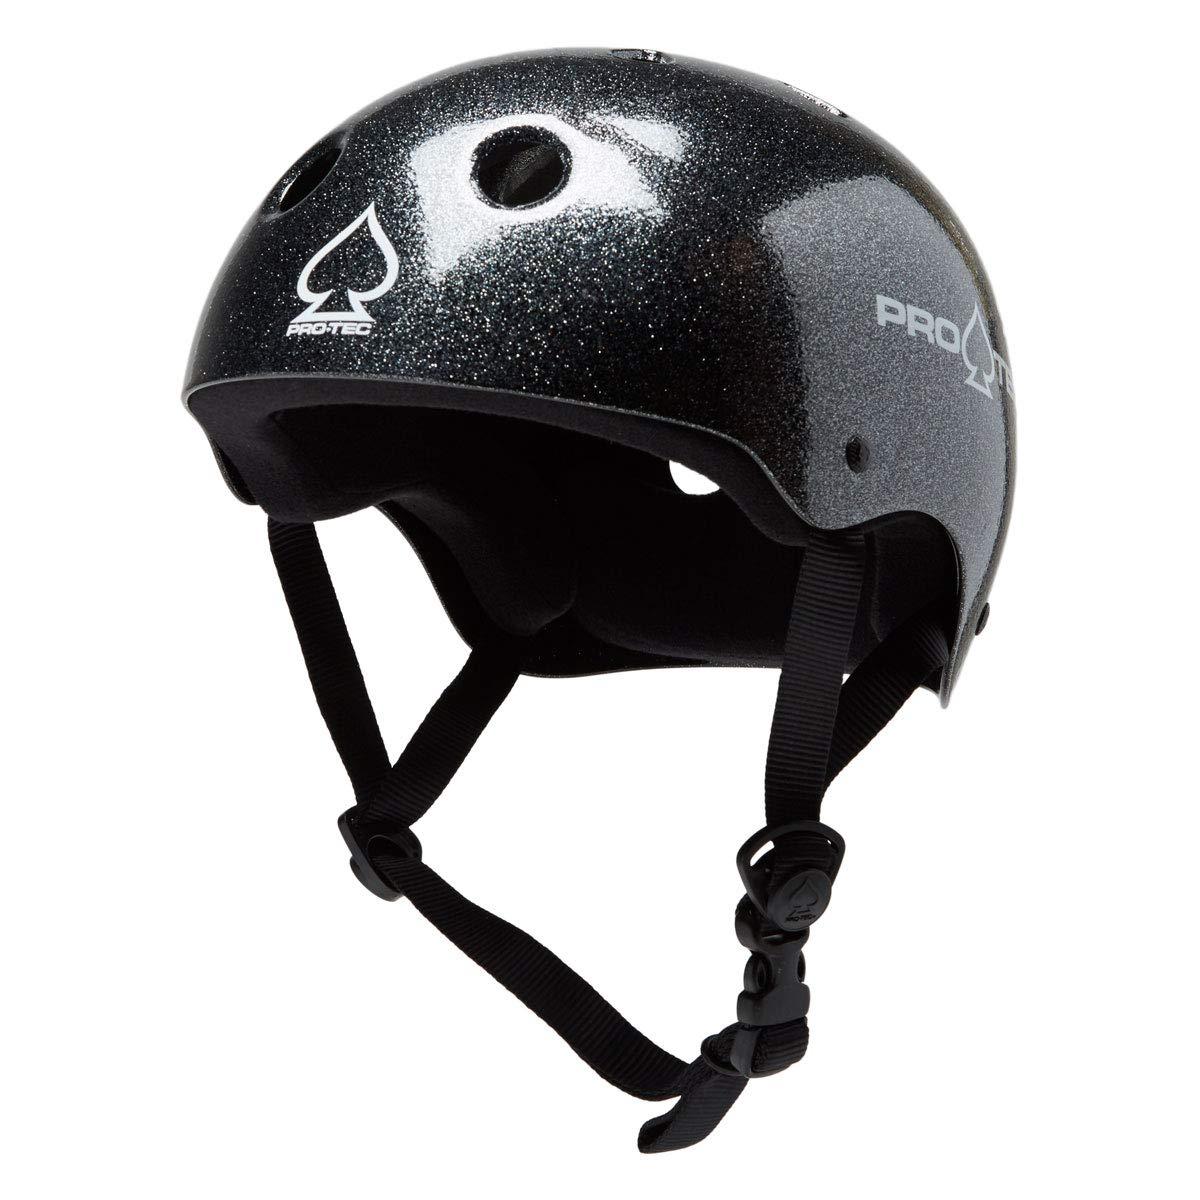 Pro Tec Classic Skate Helmet - Black Metal Flake - XL